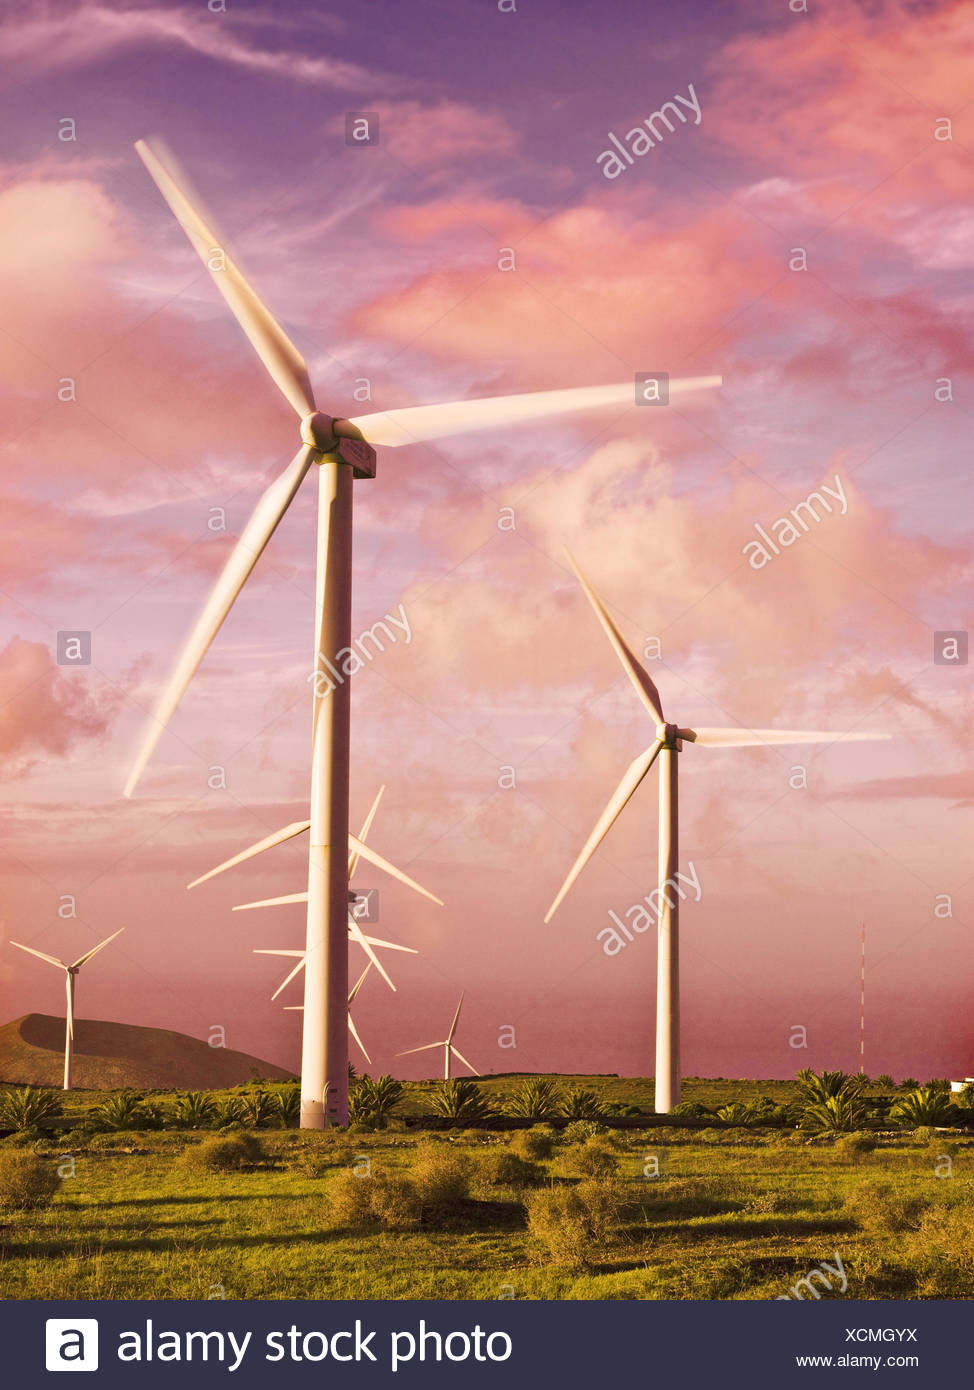 Wind power station, evening mood, Stock Photo